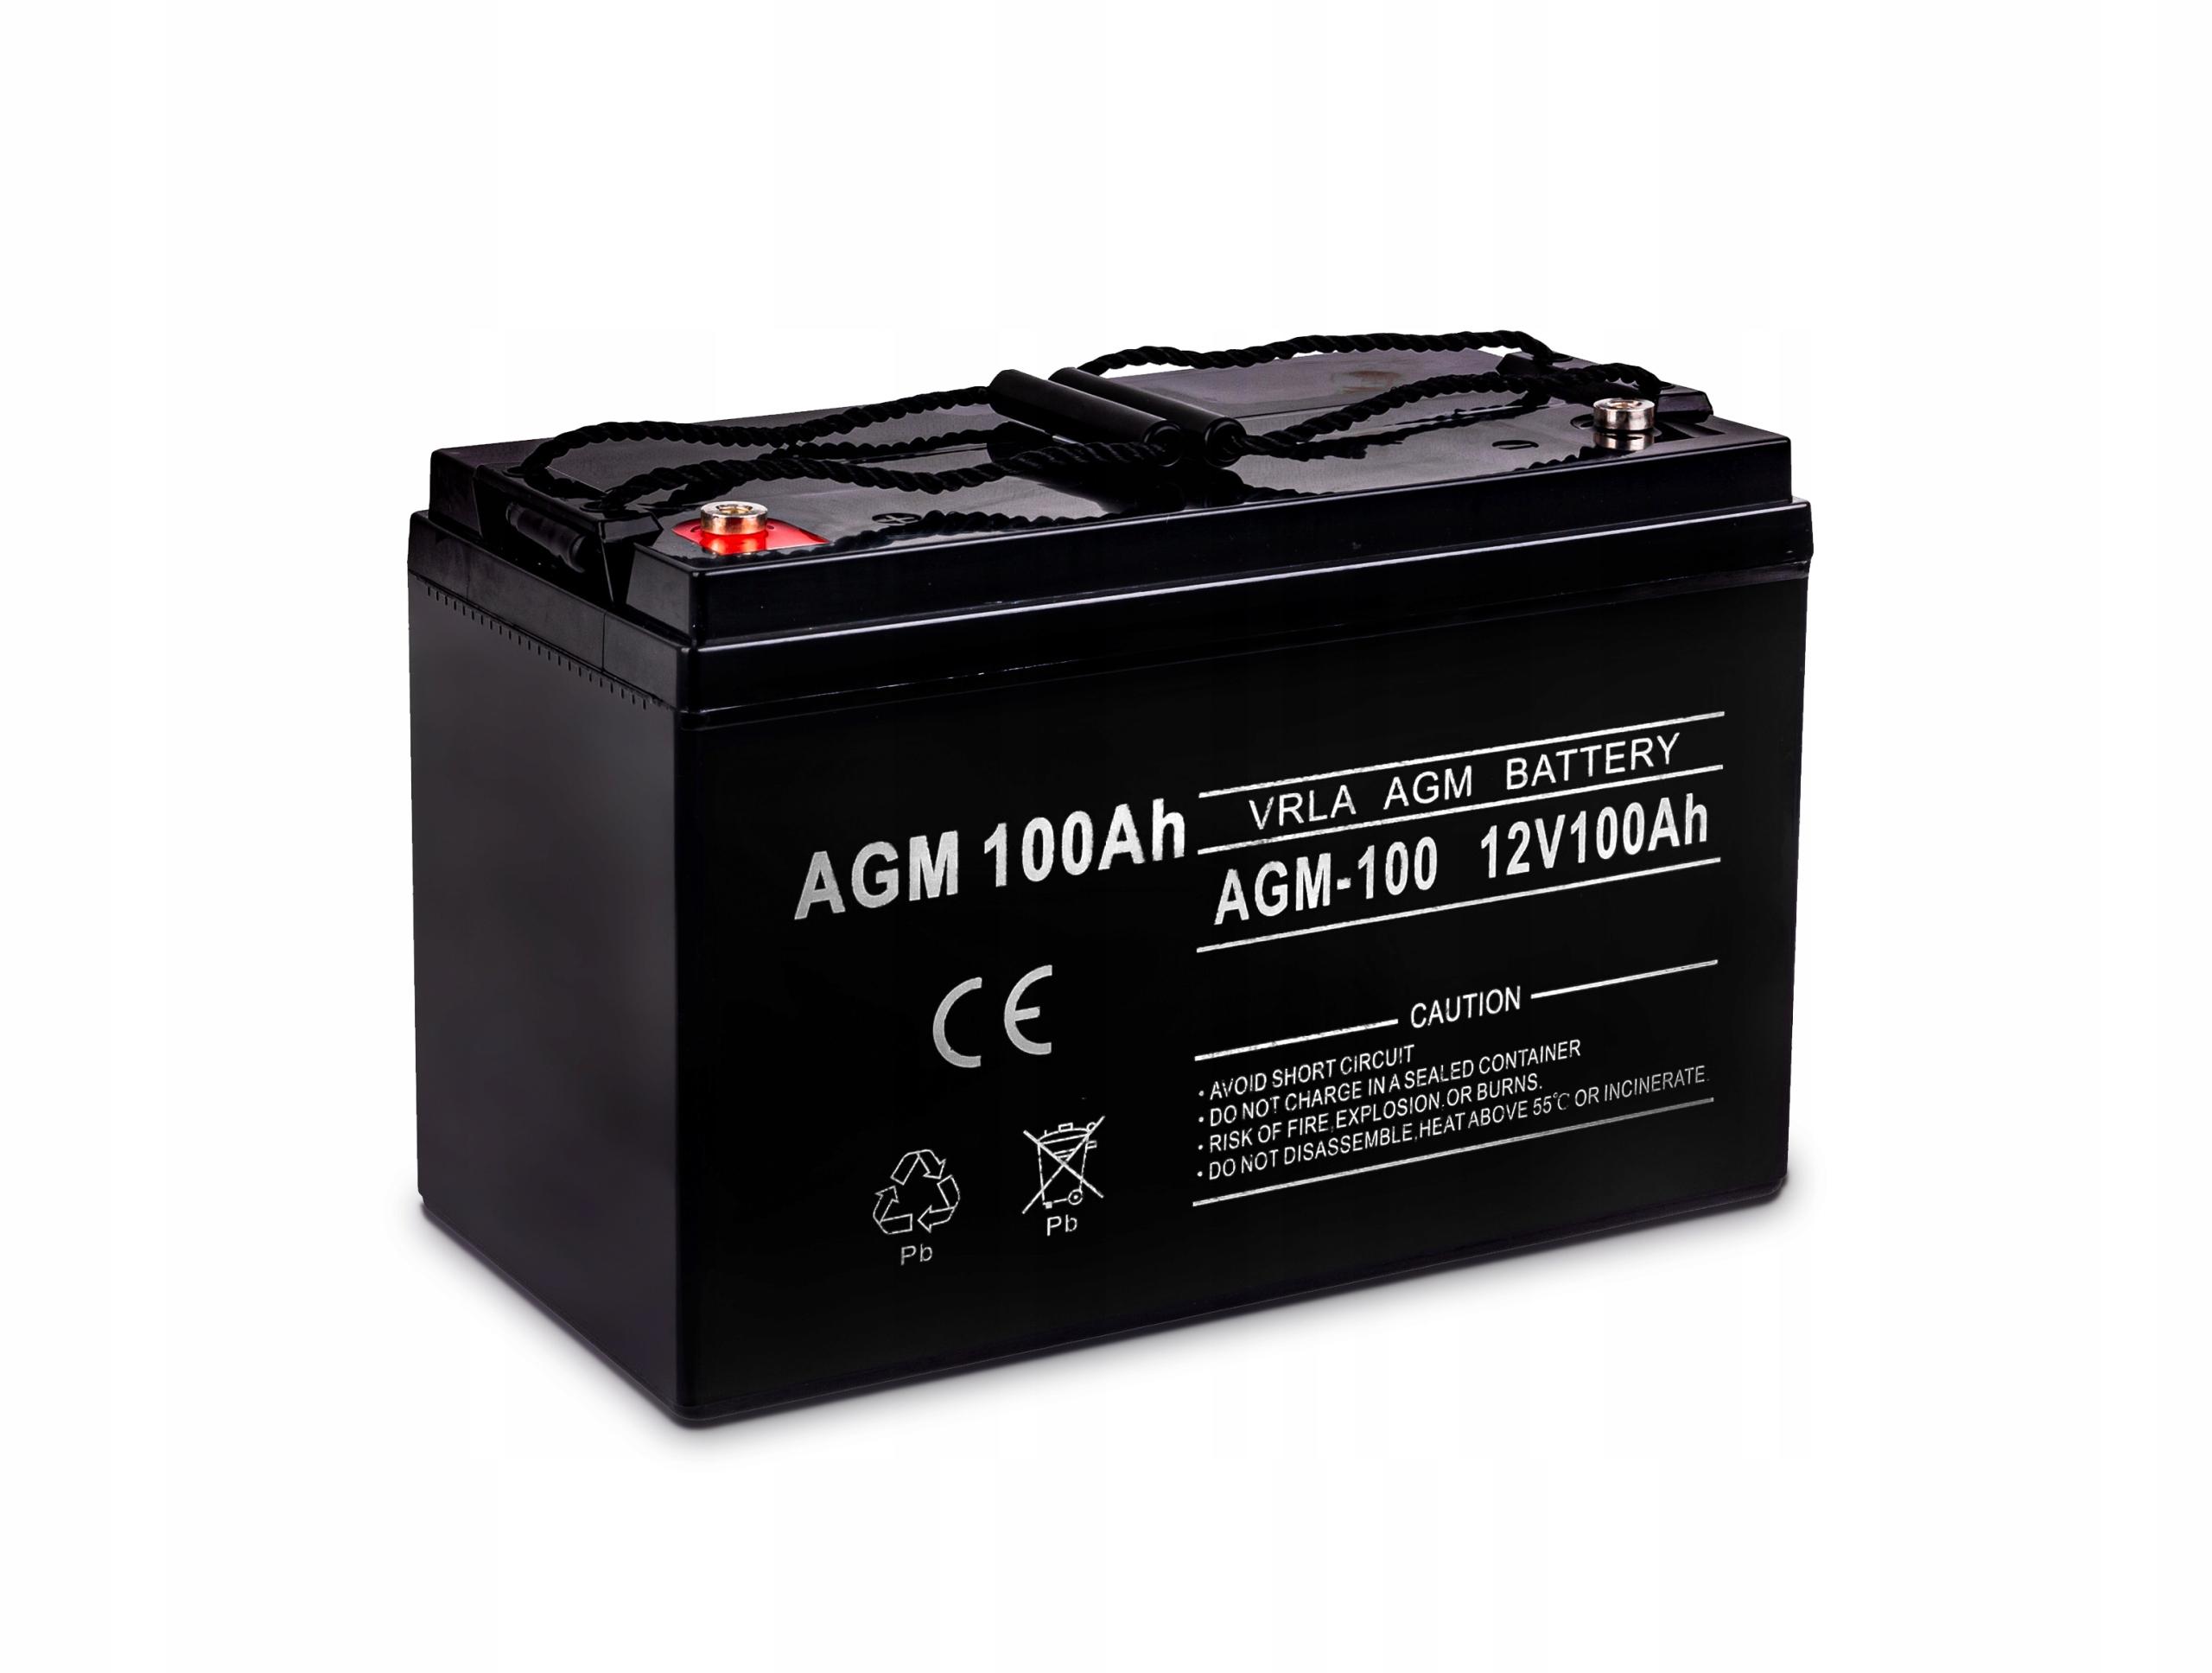 аккумулятор гелевый agm к питания 12v 100ah